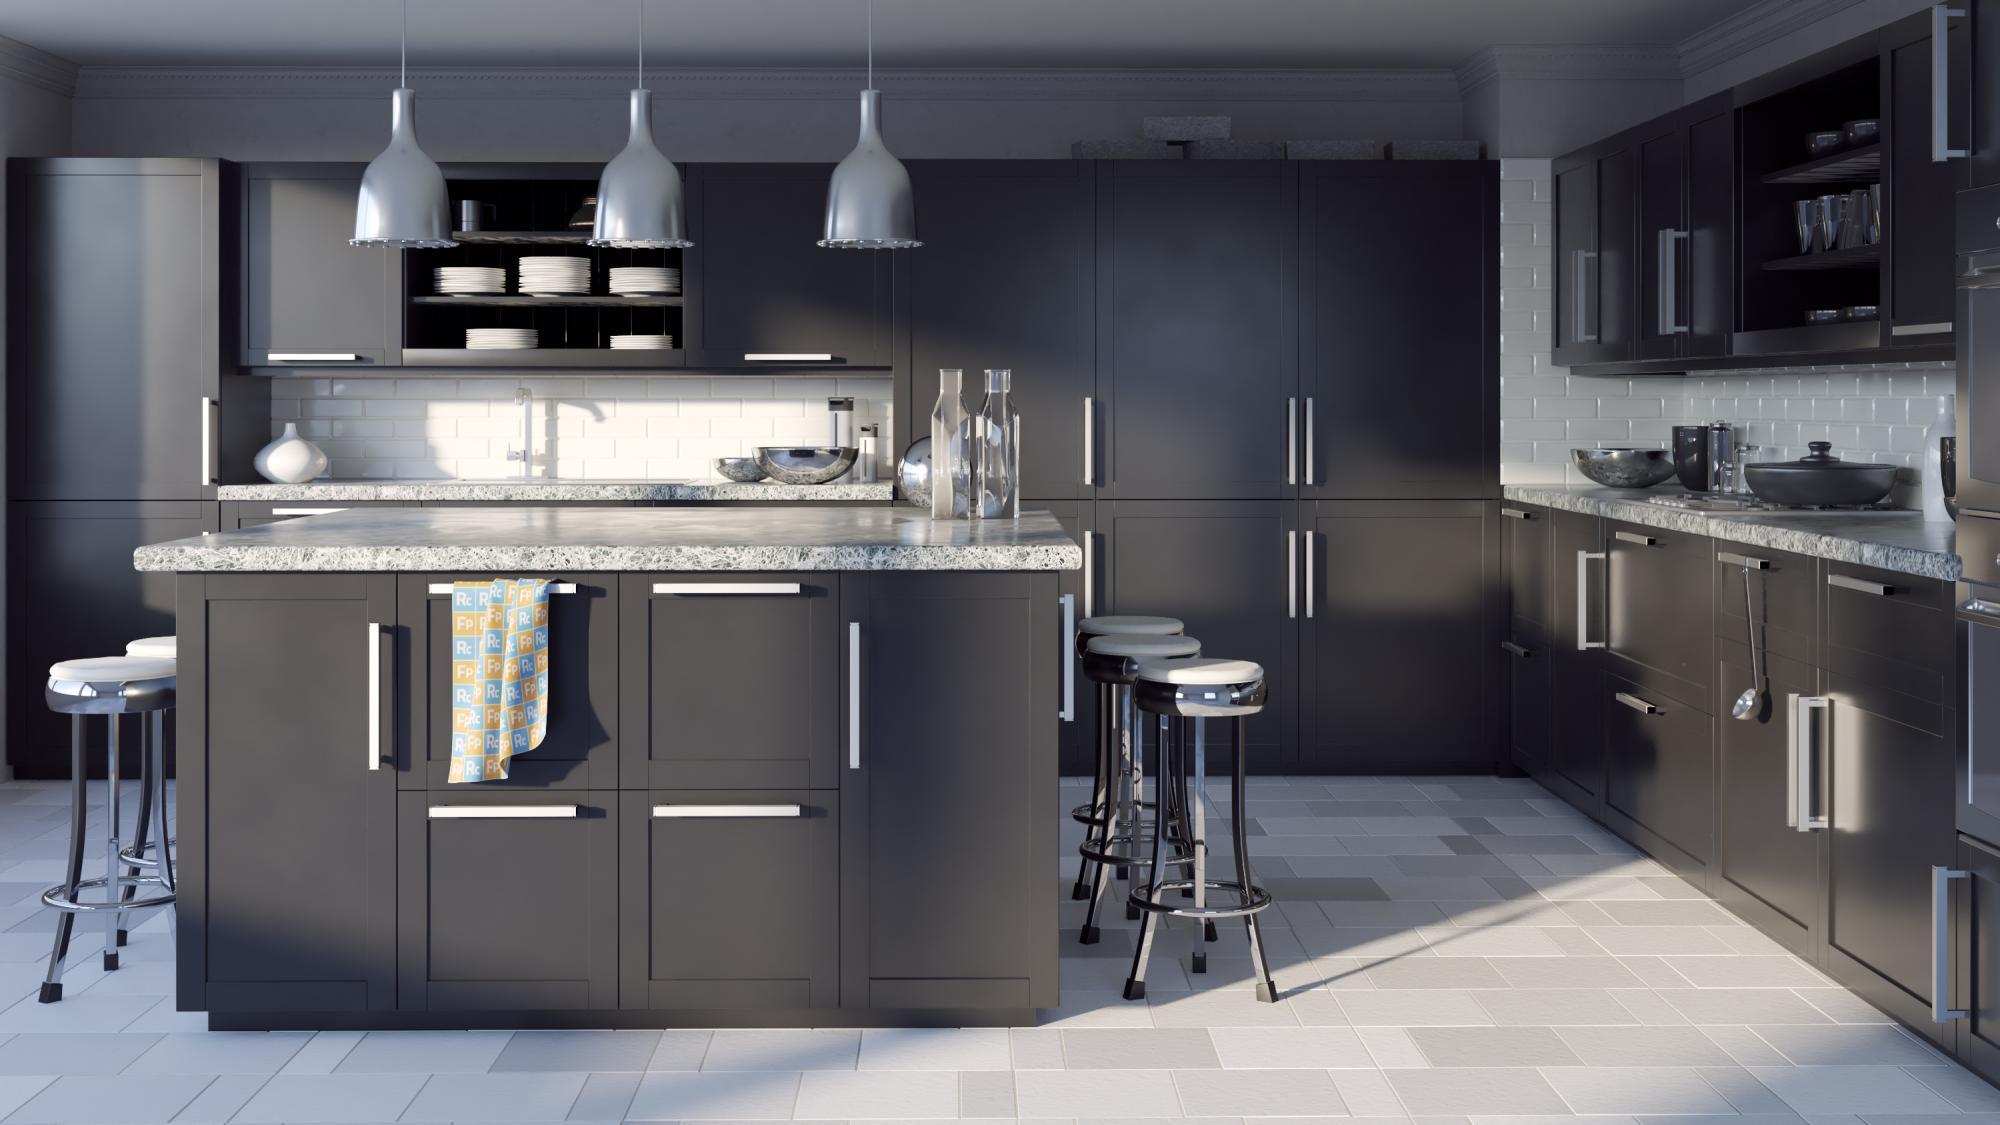 Kitchen Cabinets with RailClone-rc_tut_kitchens.jpg